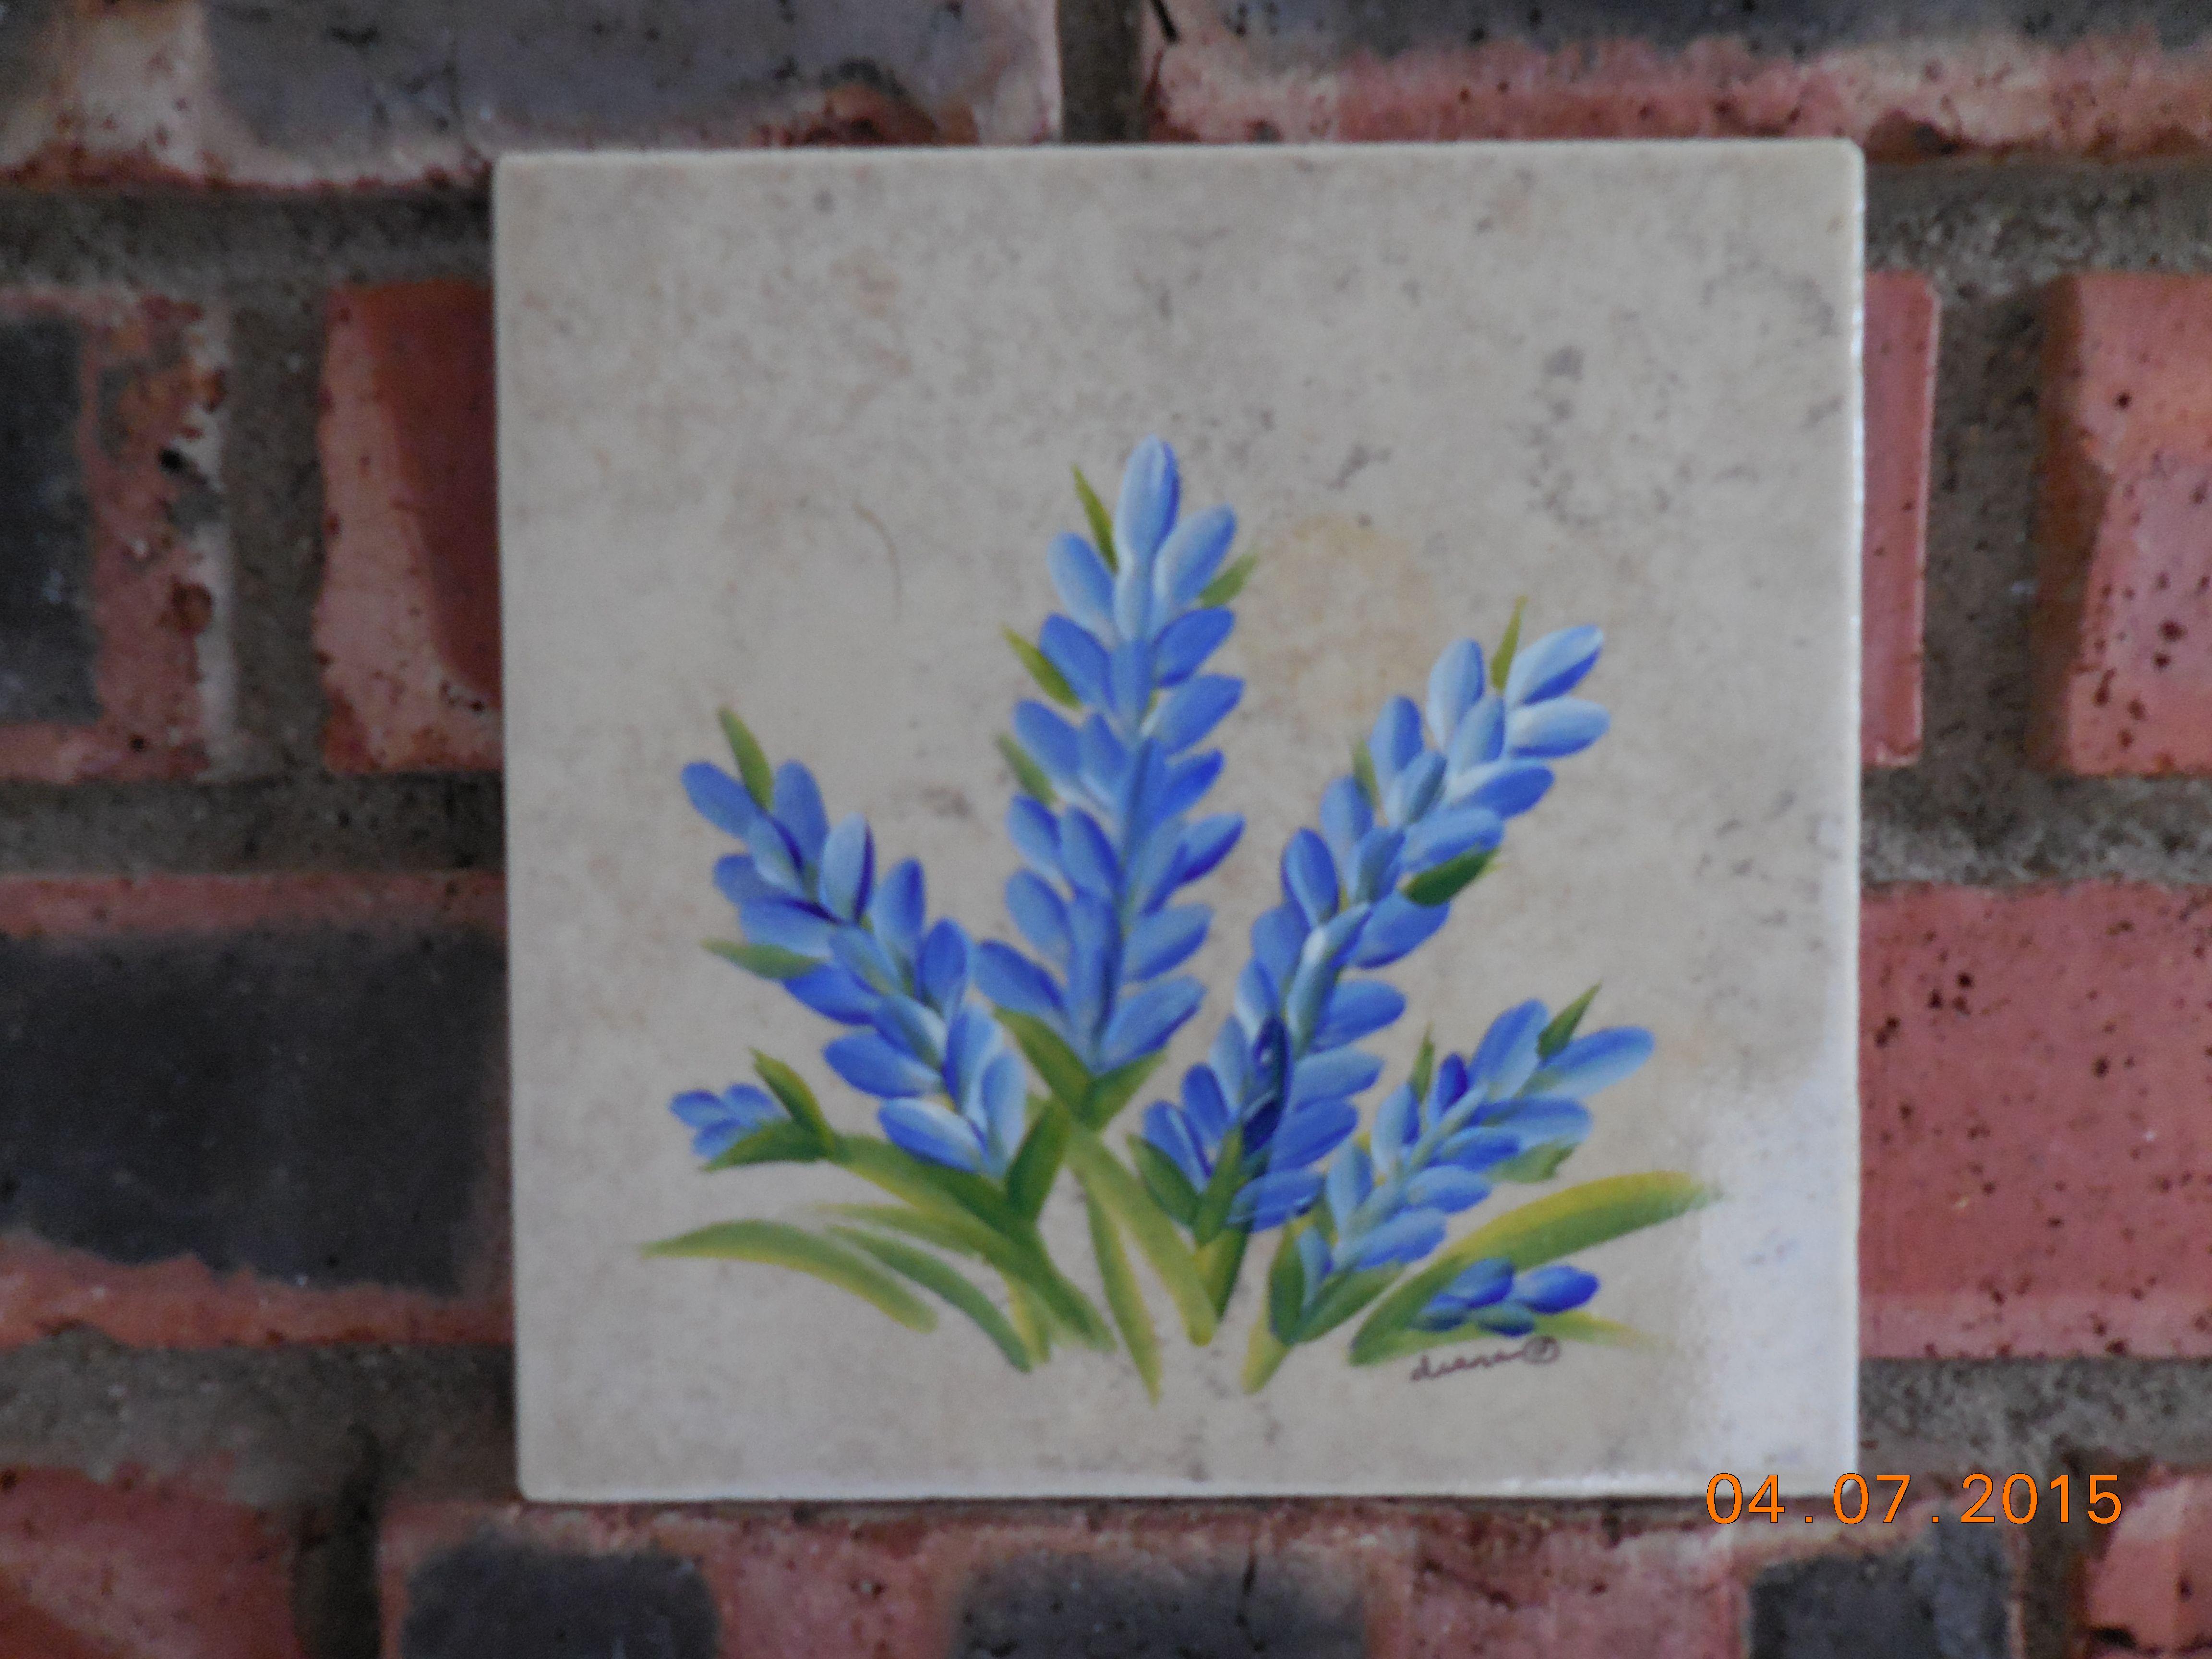 Bluebonnets on a ceramic tile 6x6 custom painted design to bluebonnets on a ceramic tile 6x6 custom painted design to incorporate into dailygadgetfo Images